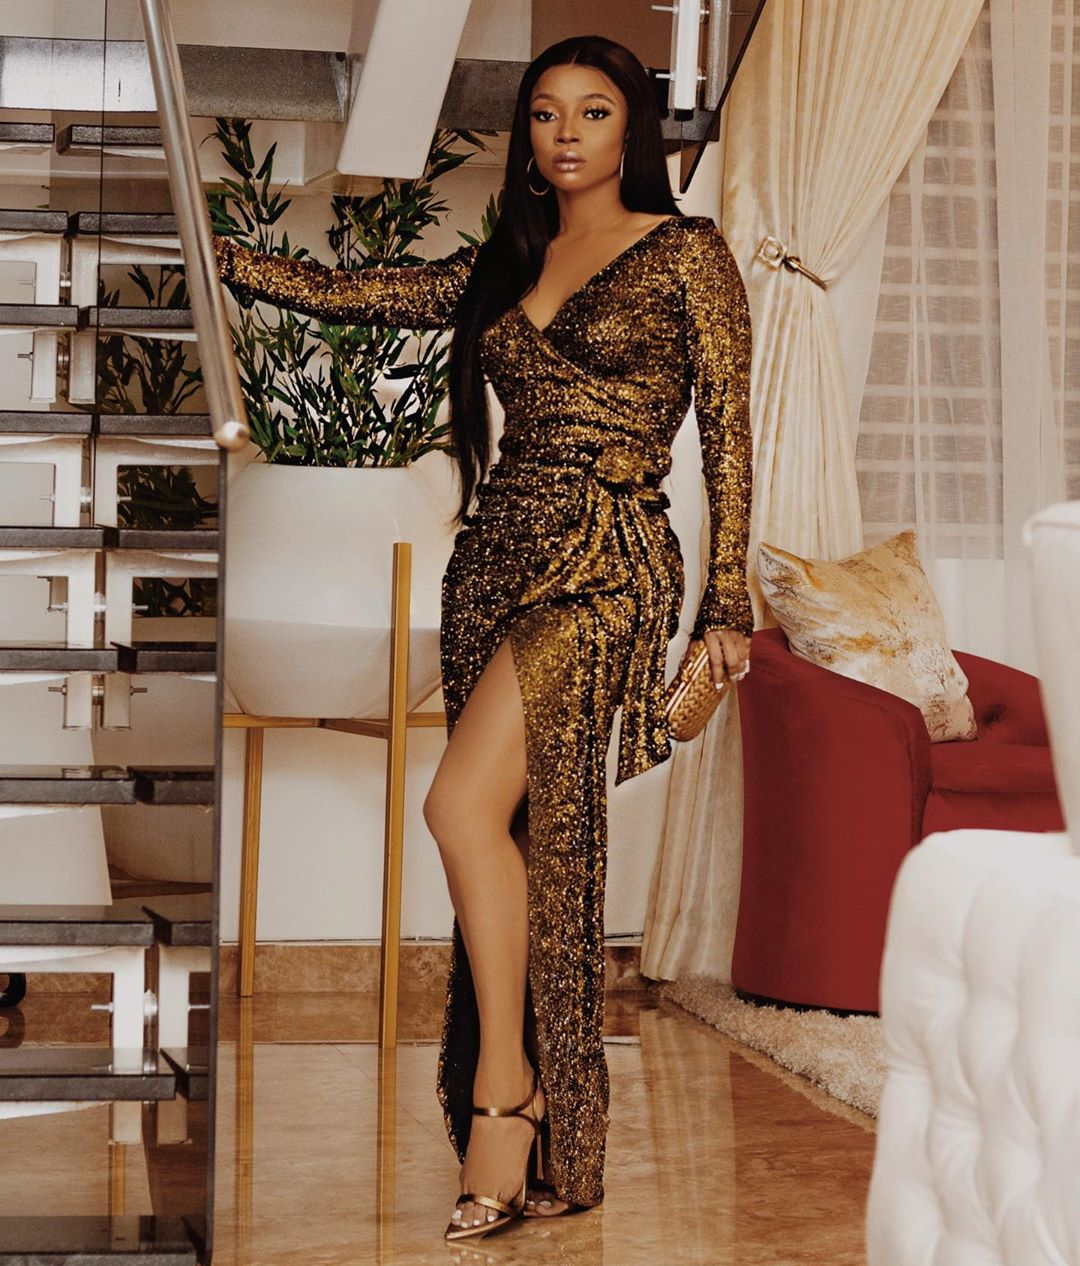 toke-makinwa-stylish-nigerian-african-celebrity